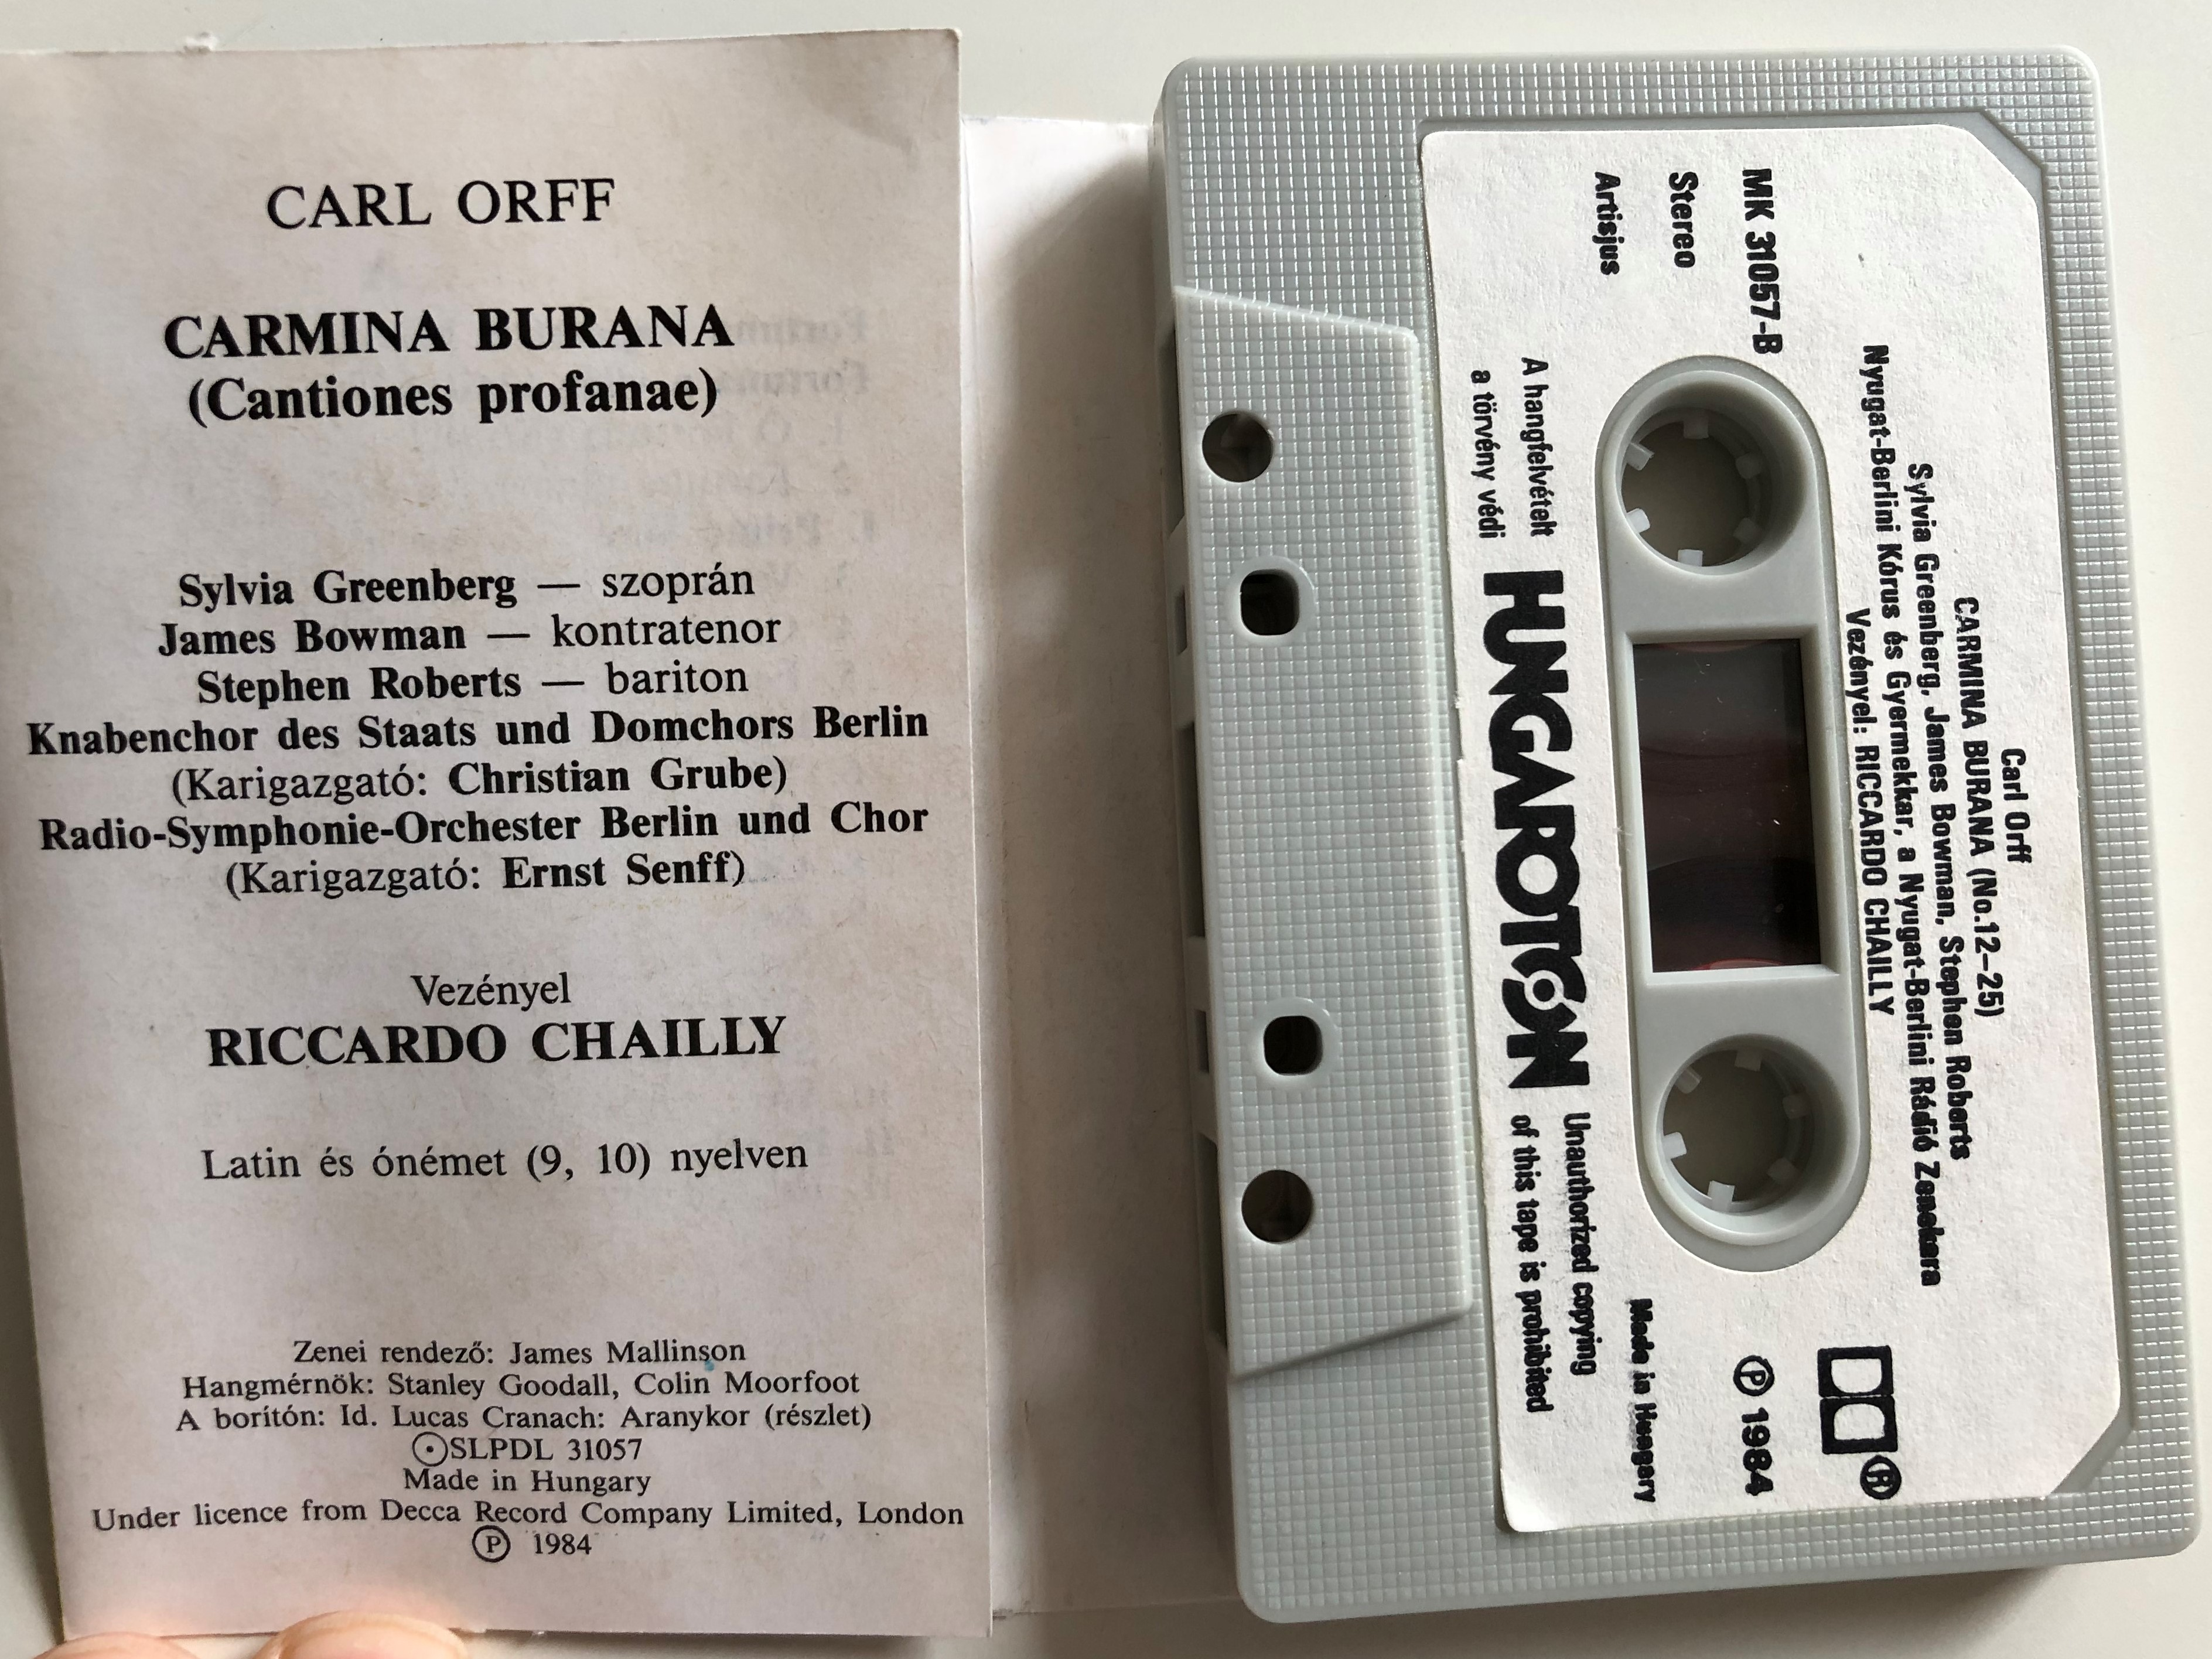 carl-orff-carmina-burana-sylvia-greenberg-james-bowman-stephen-roberts-rso-berlin-und-chor-conducted-riccardo-chailly-hungaroton-cassette-stereo-mkl-31057-2-.jpg